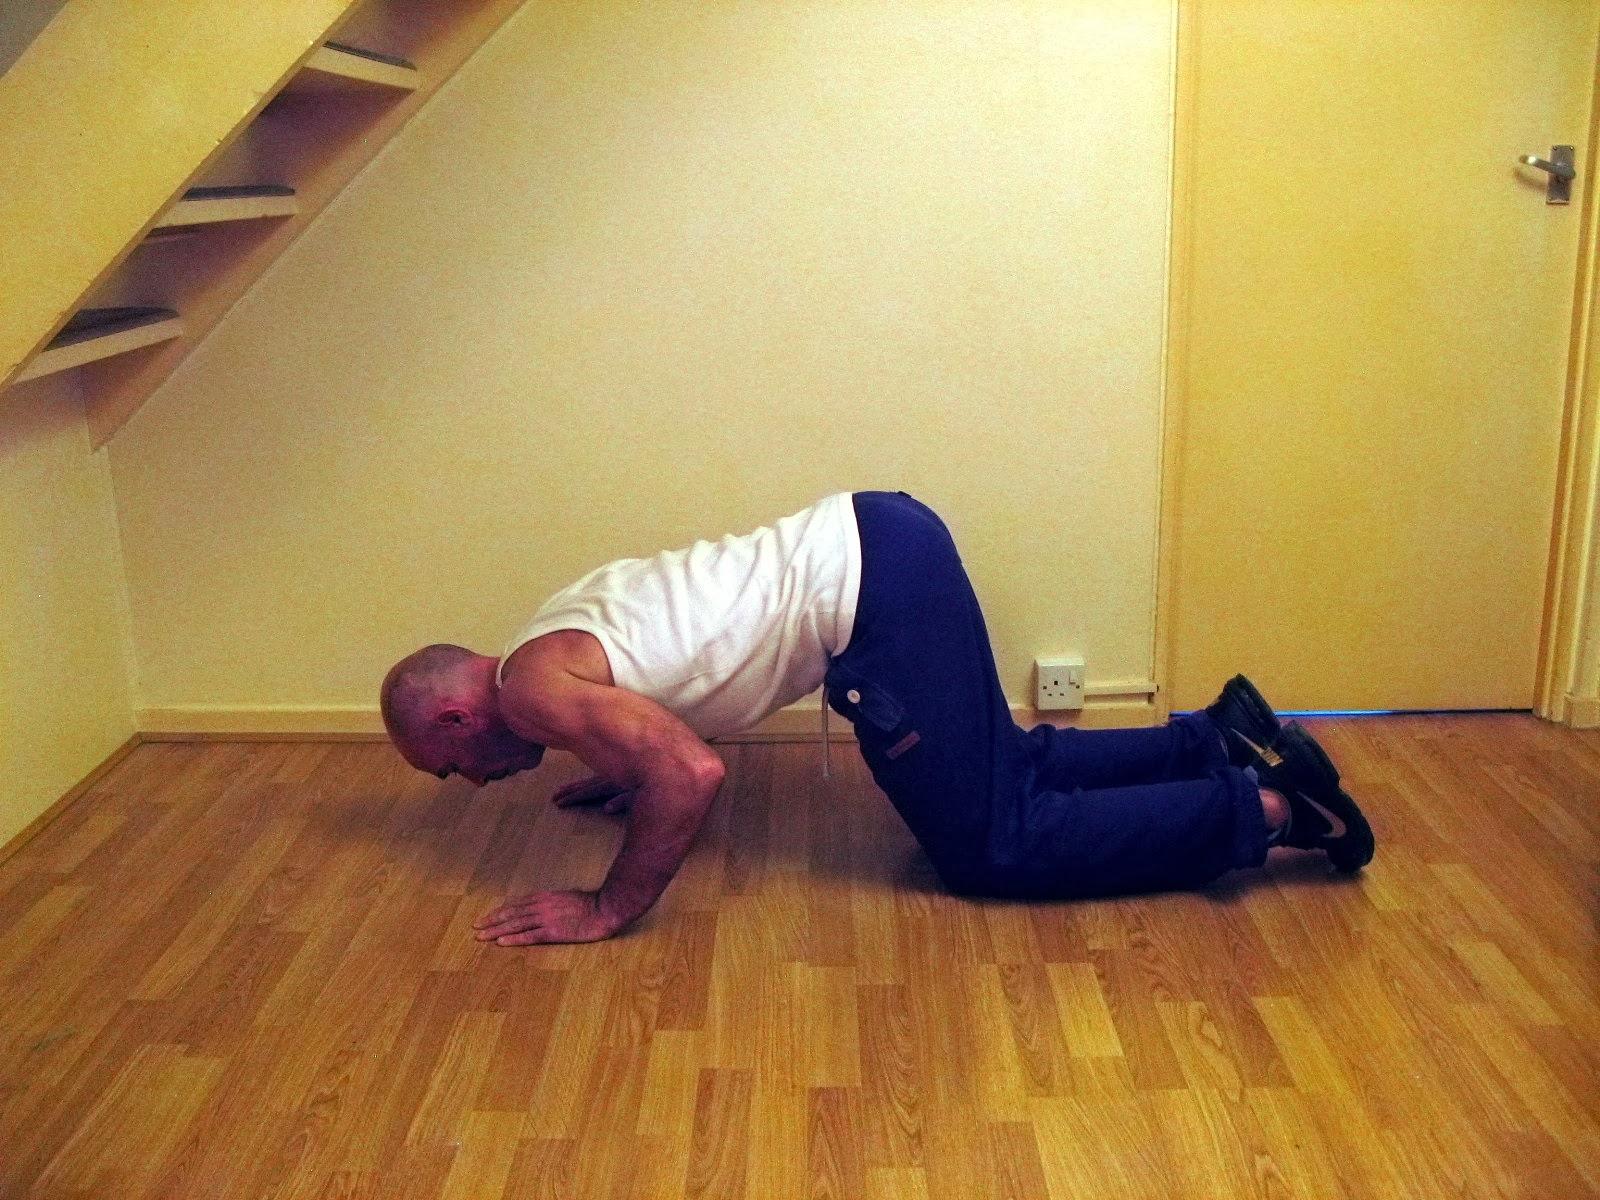 start bodyweight training push up progression